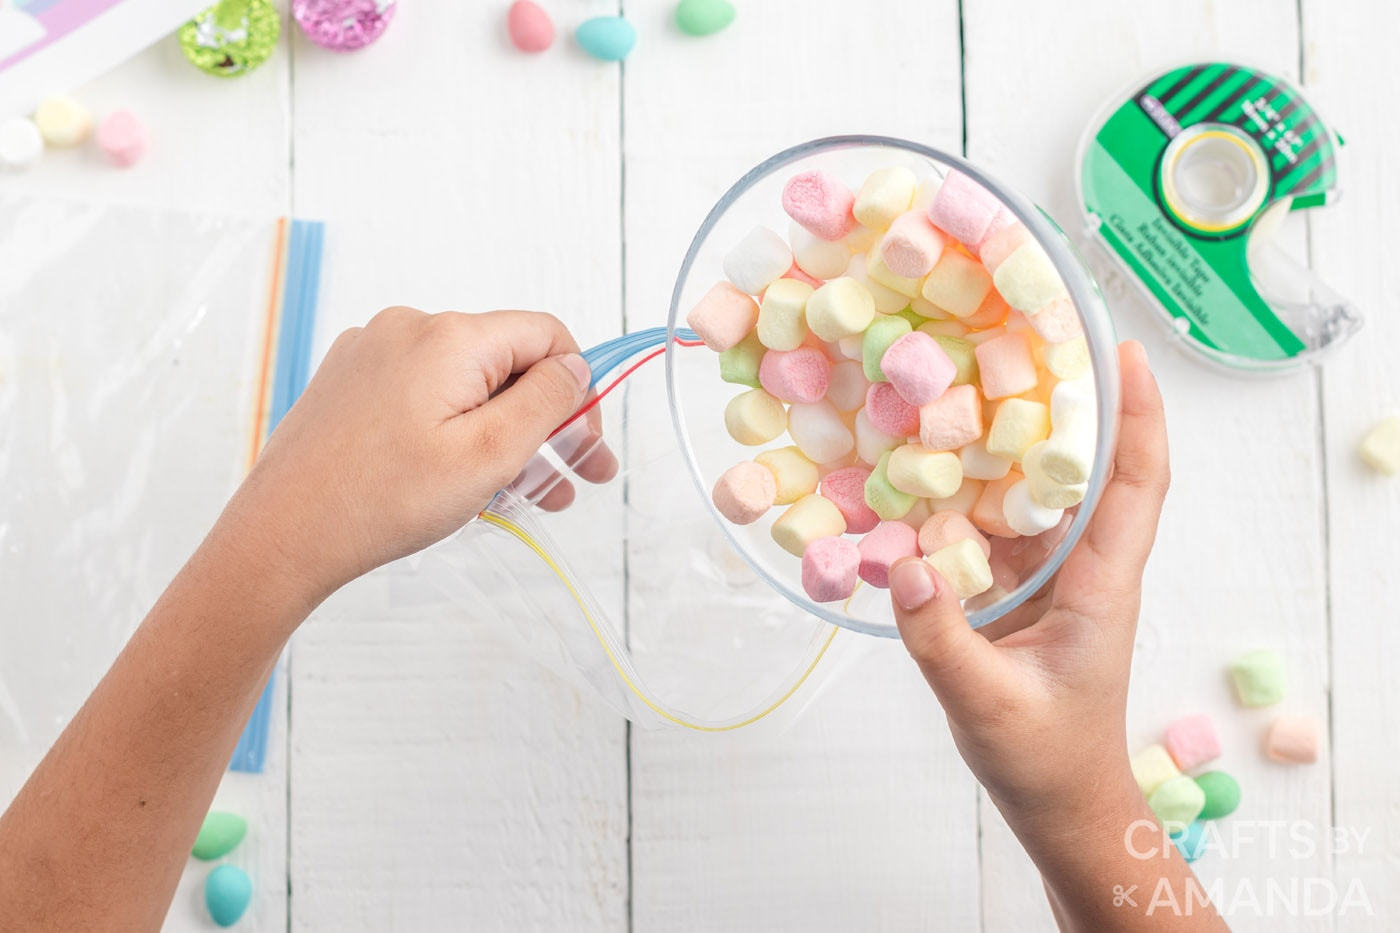 pouring mini marshmallows into a sandwich bag